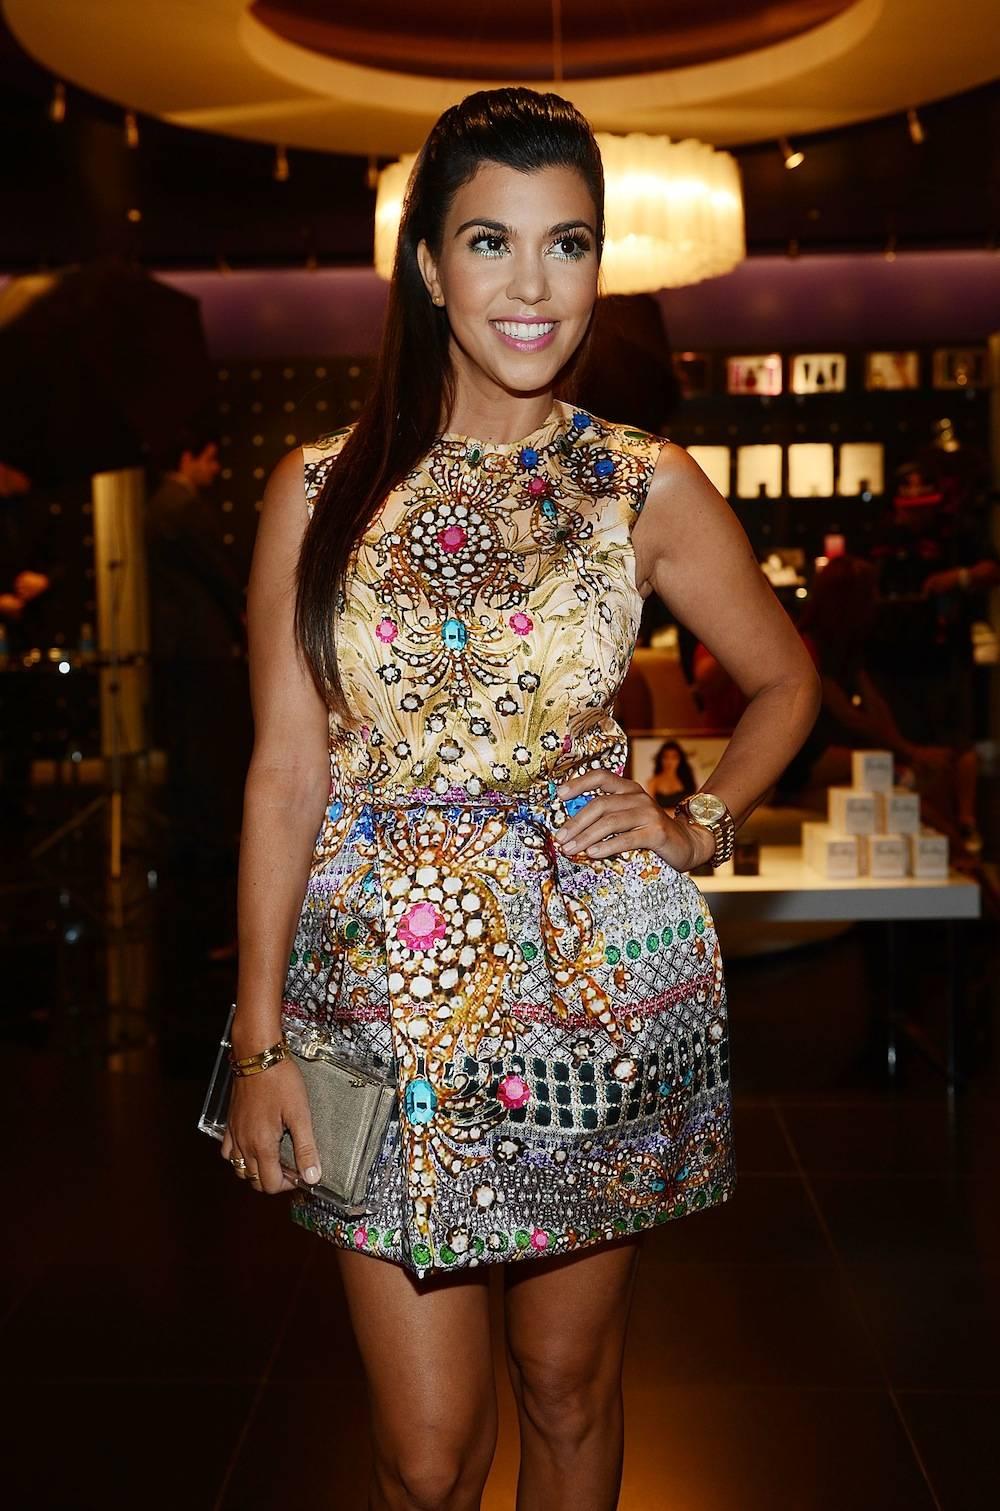 Kourtney Kardashian To Appear At Kardashian Khaos At The Mirage Hotel & Casino